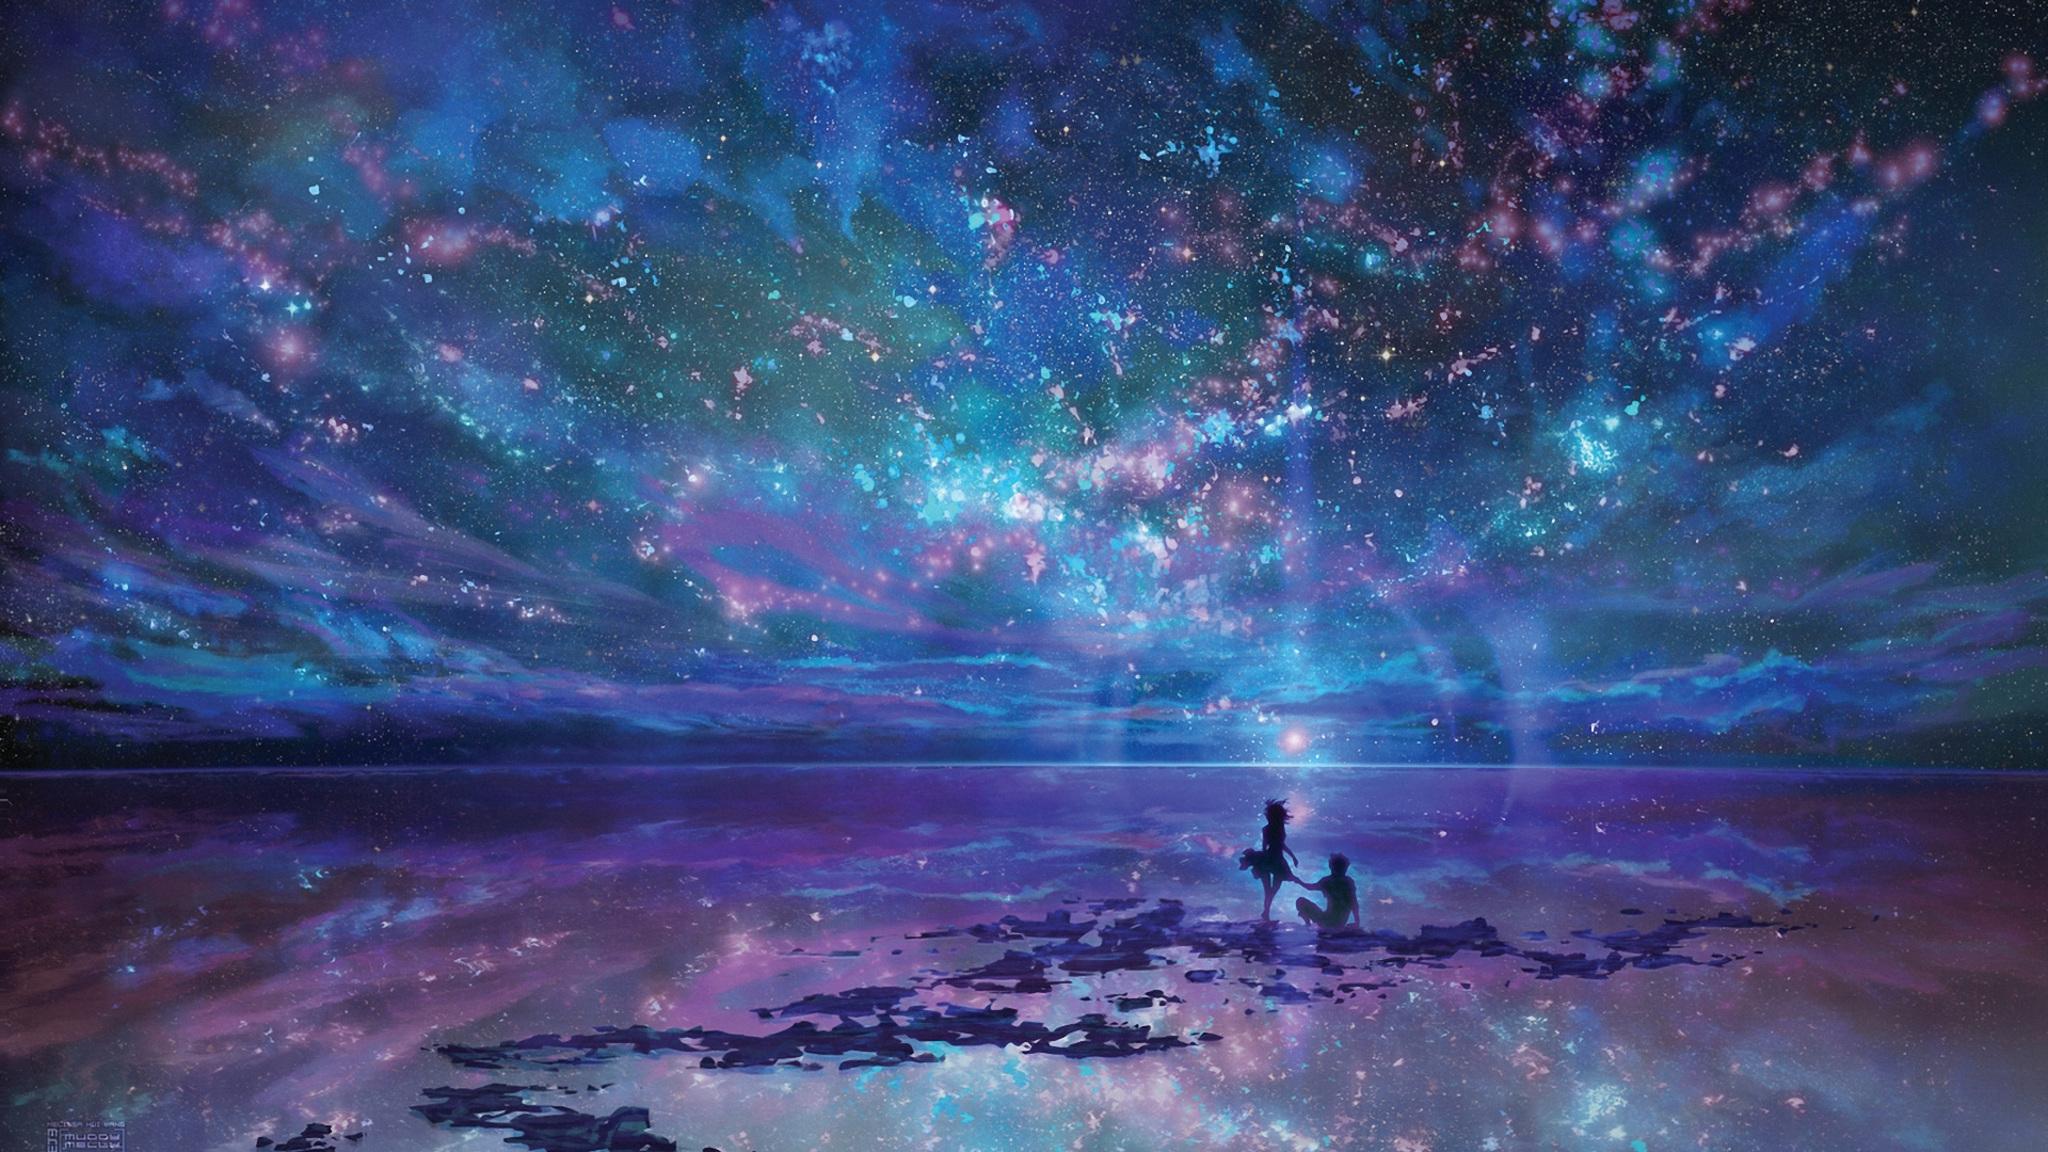 Cute Wallpapers For Girls  2048x1152 Fantasy Ocean Stars 2048x1152 Resolution Hd 4k